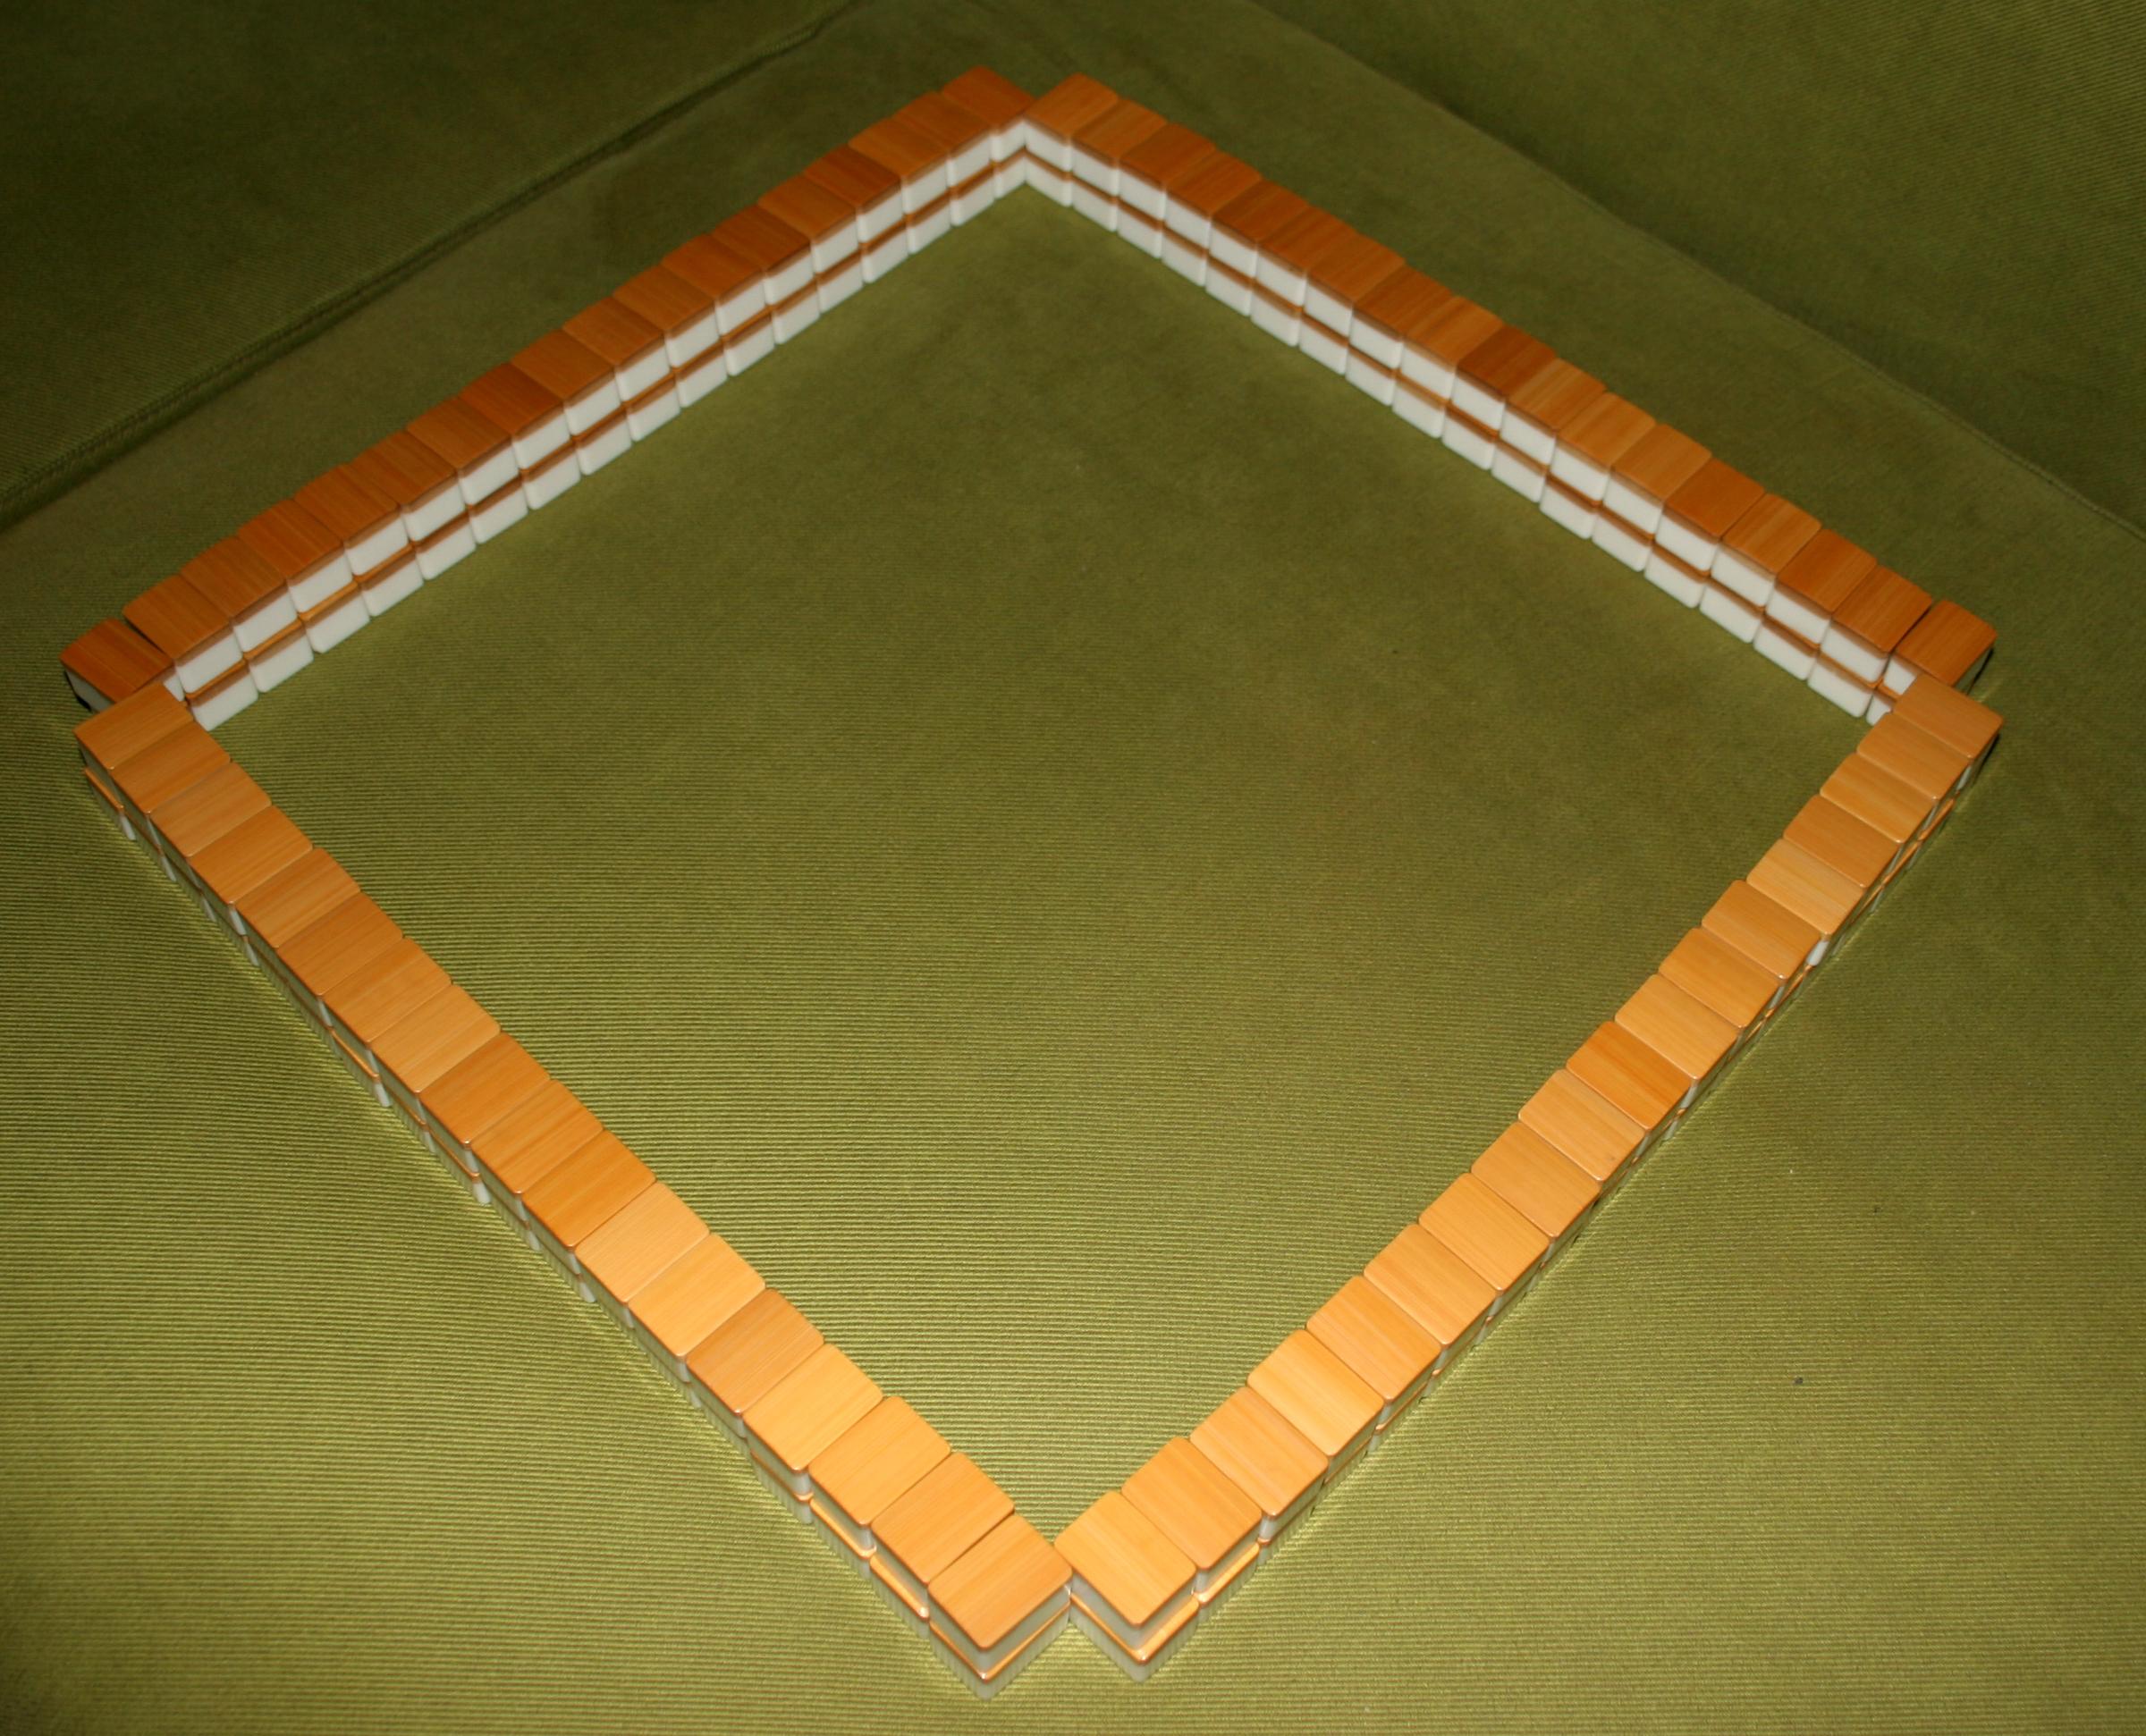 spielregeln mahjong